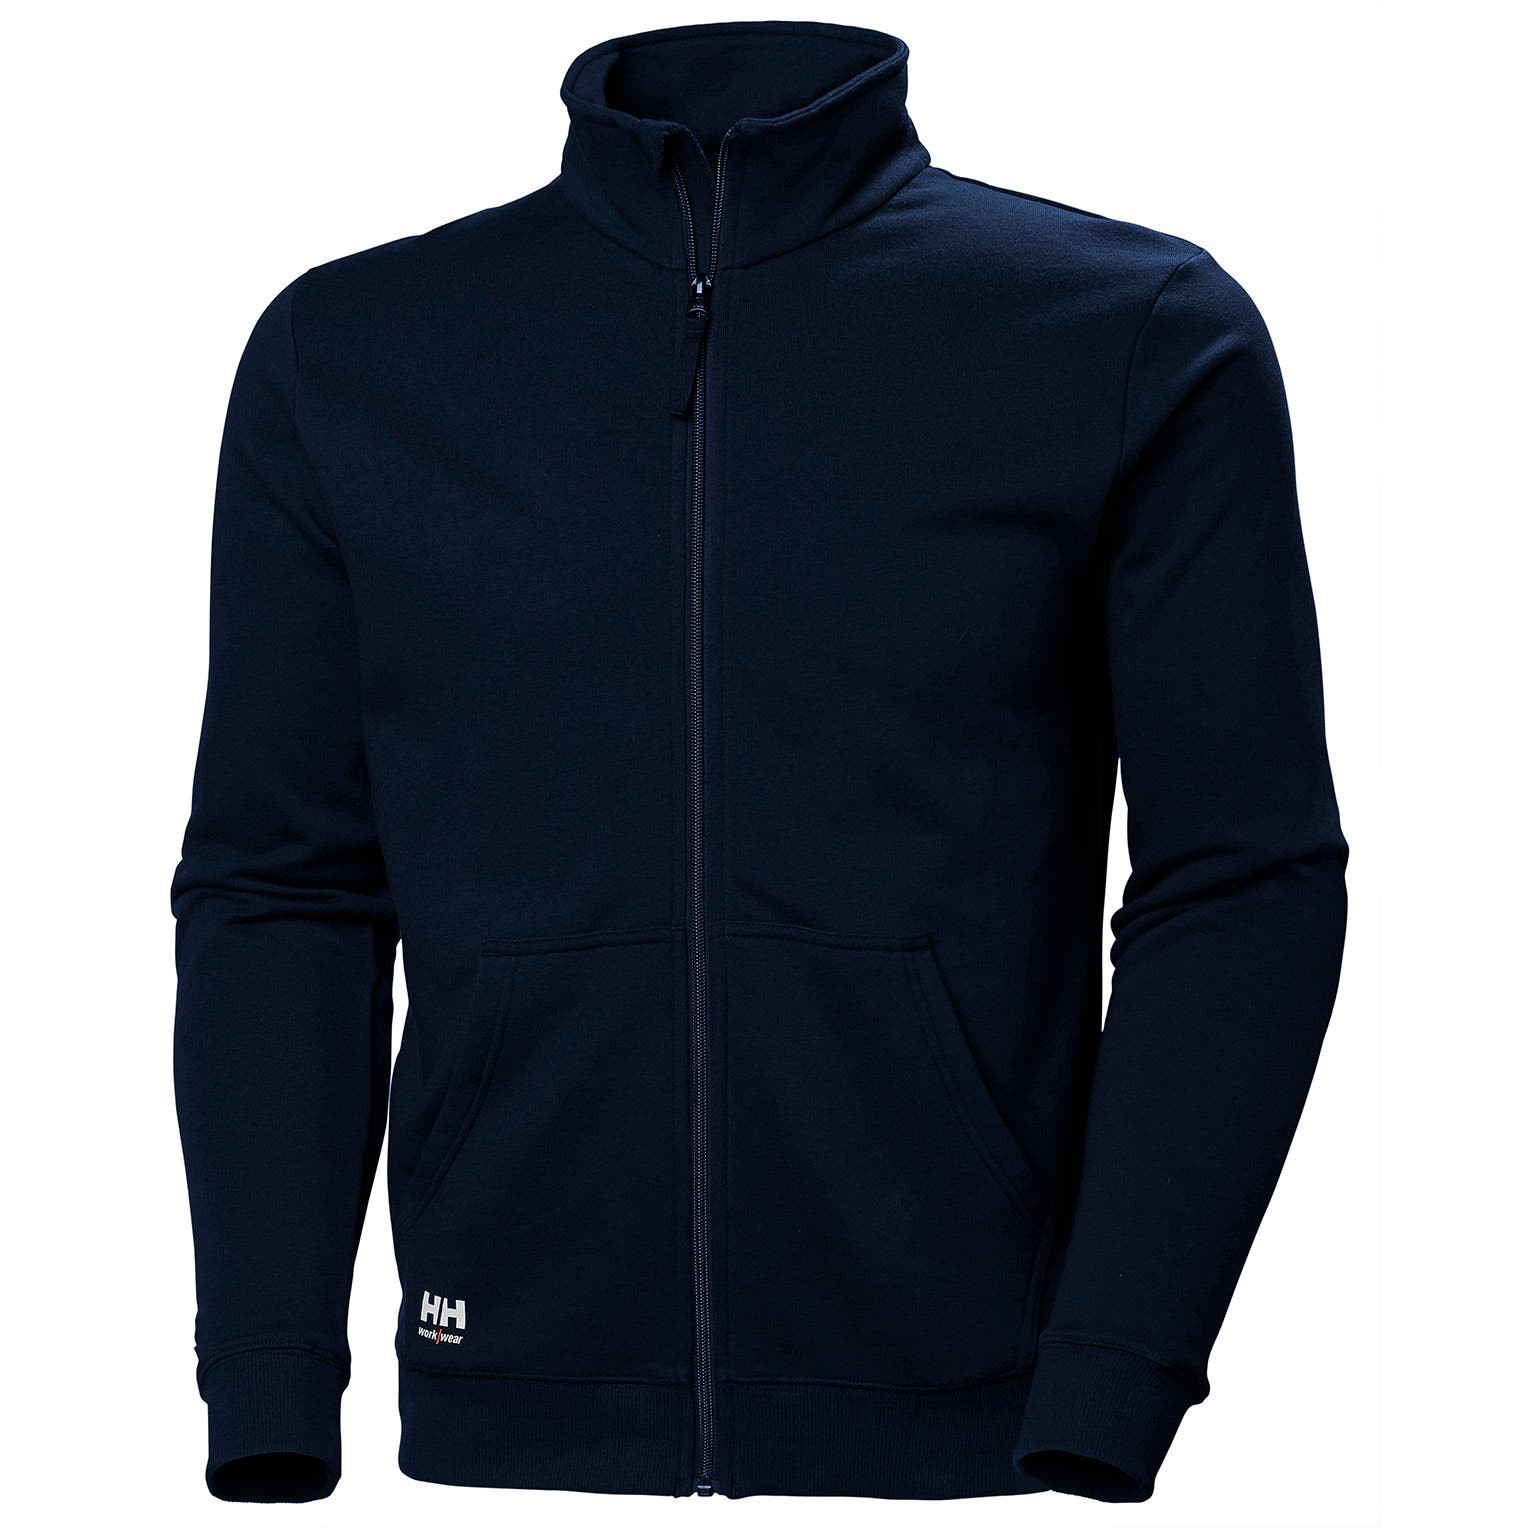 Свитшот на молнии Helly Hansen Manchester Zip Sweatshirt - 79212 (Navy; L)